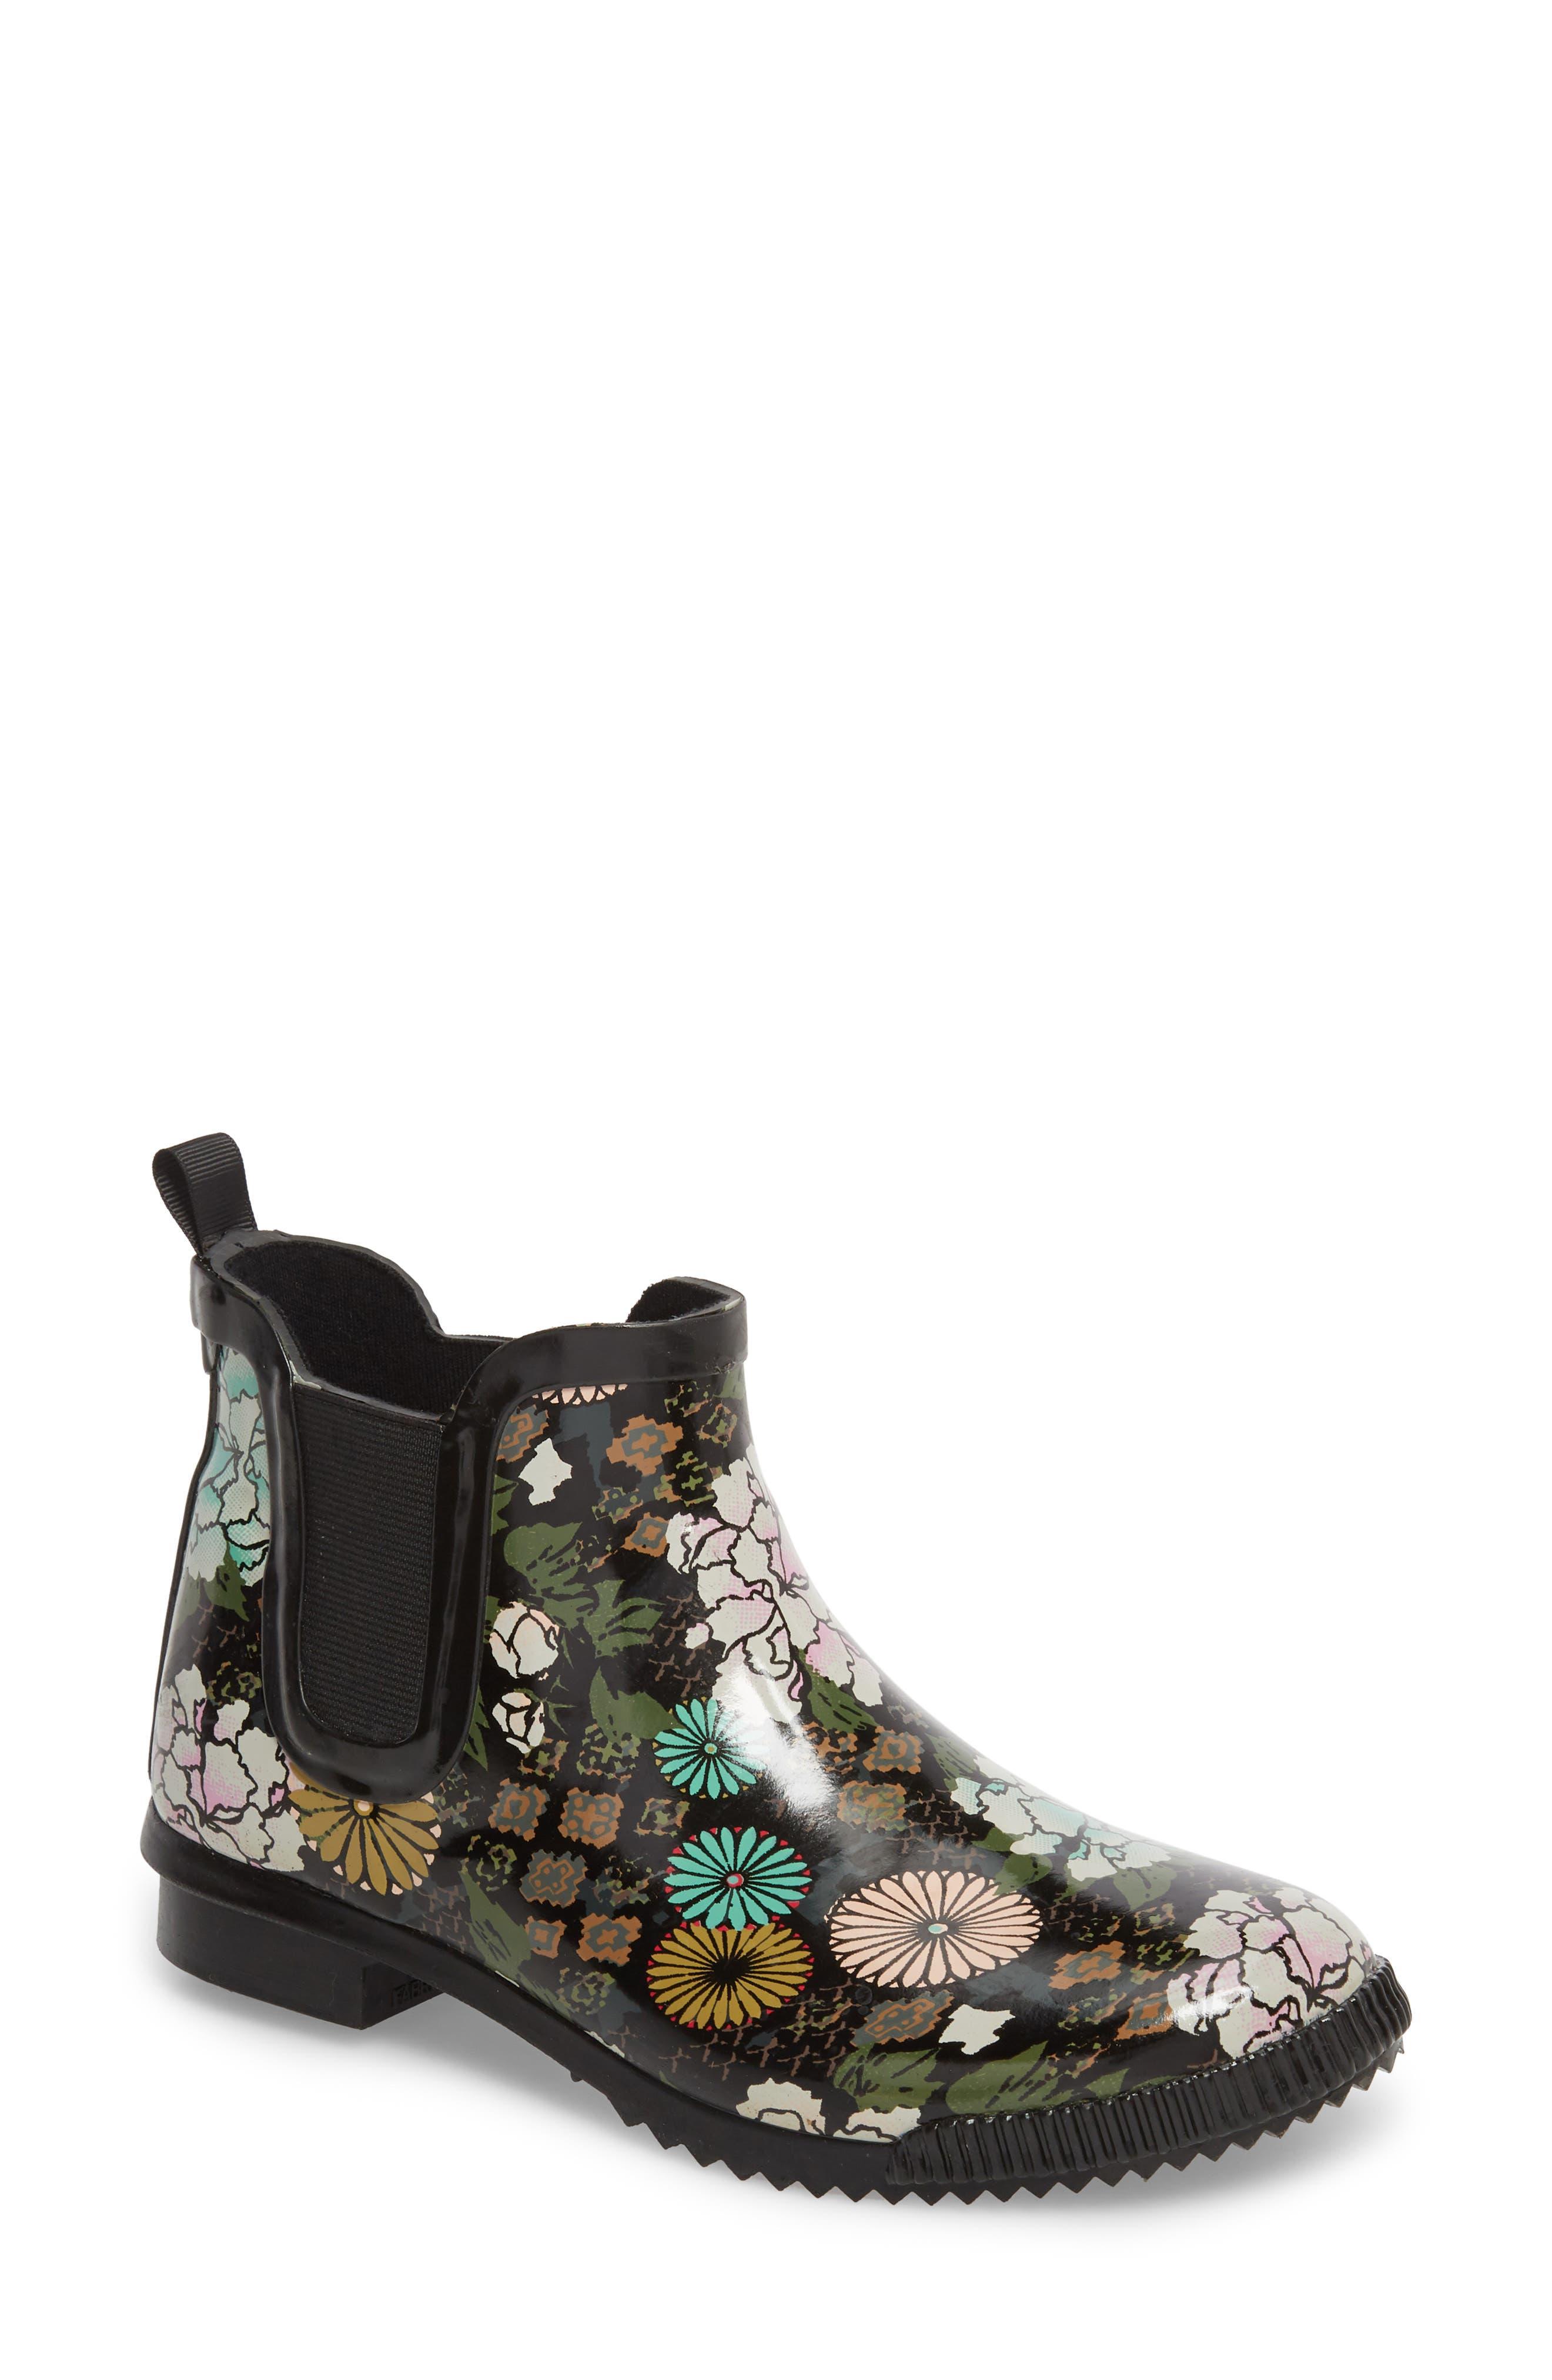 Cougar Regent Chelsea Waterproof Rain Boot, Black